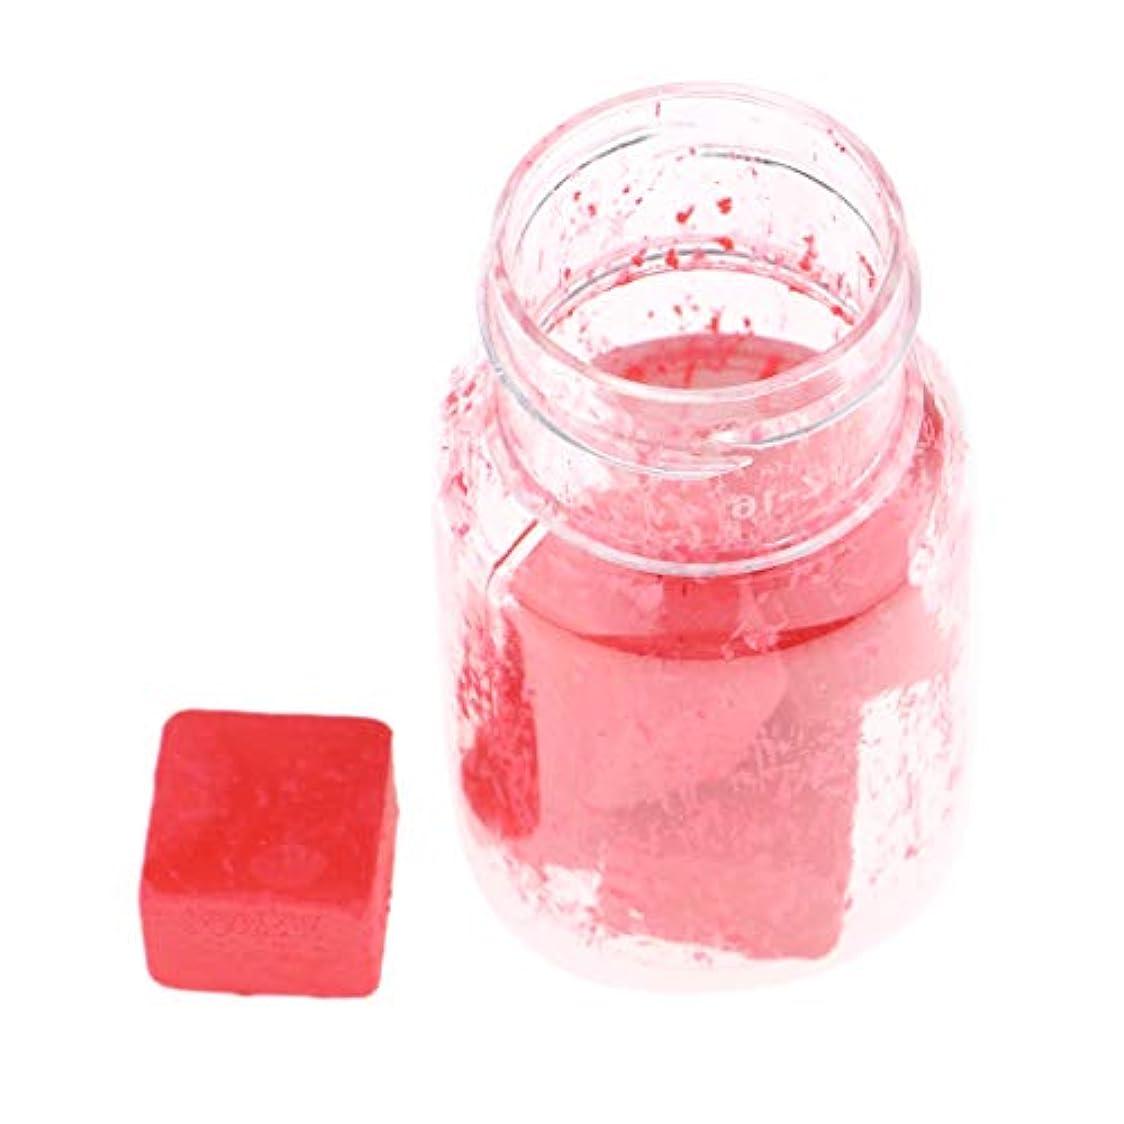 CUTICATE 口紅の原料 リップスティック顔料 DIYリップライナー DIY工芸品 9色選択でき - I